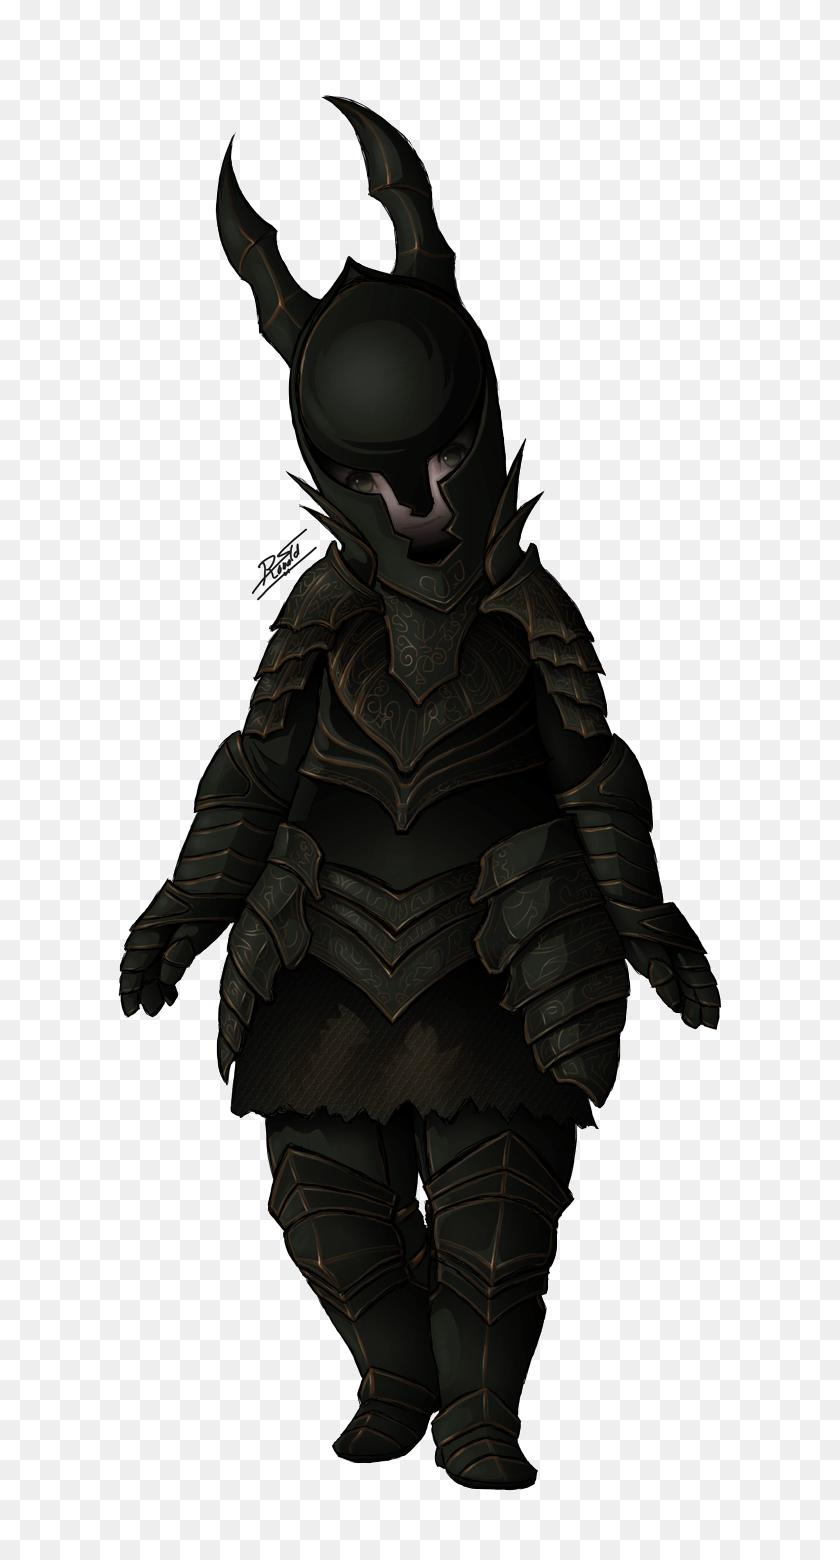 Dark Souls Artorias Transparent Png - Statue PNG – Stunning